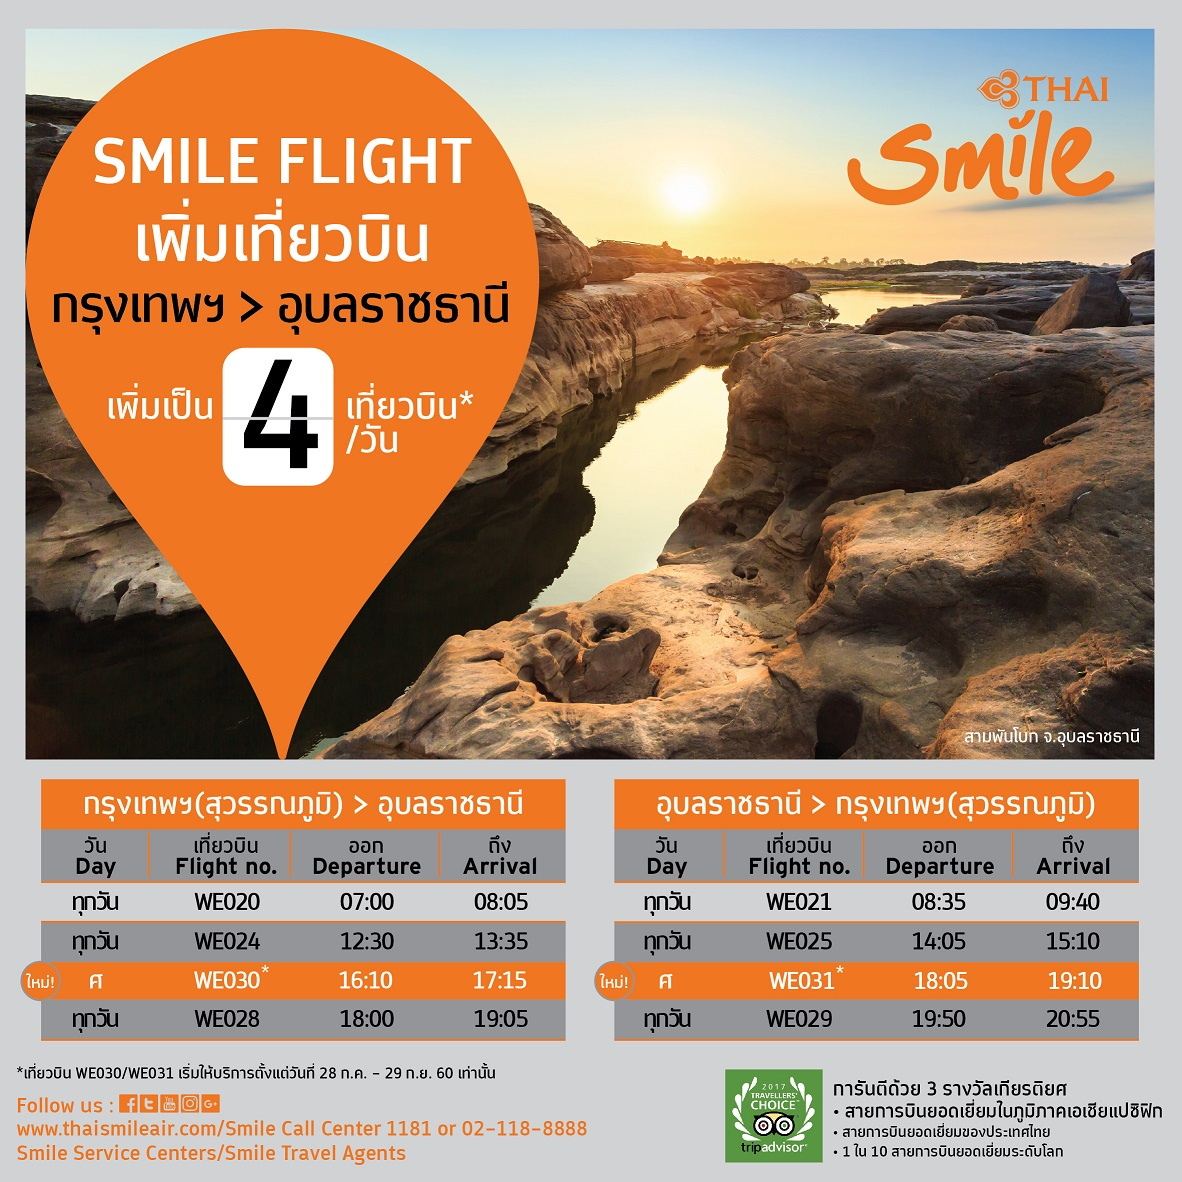 Increase Flight UBP 1